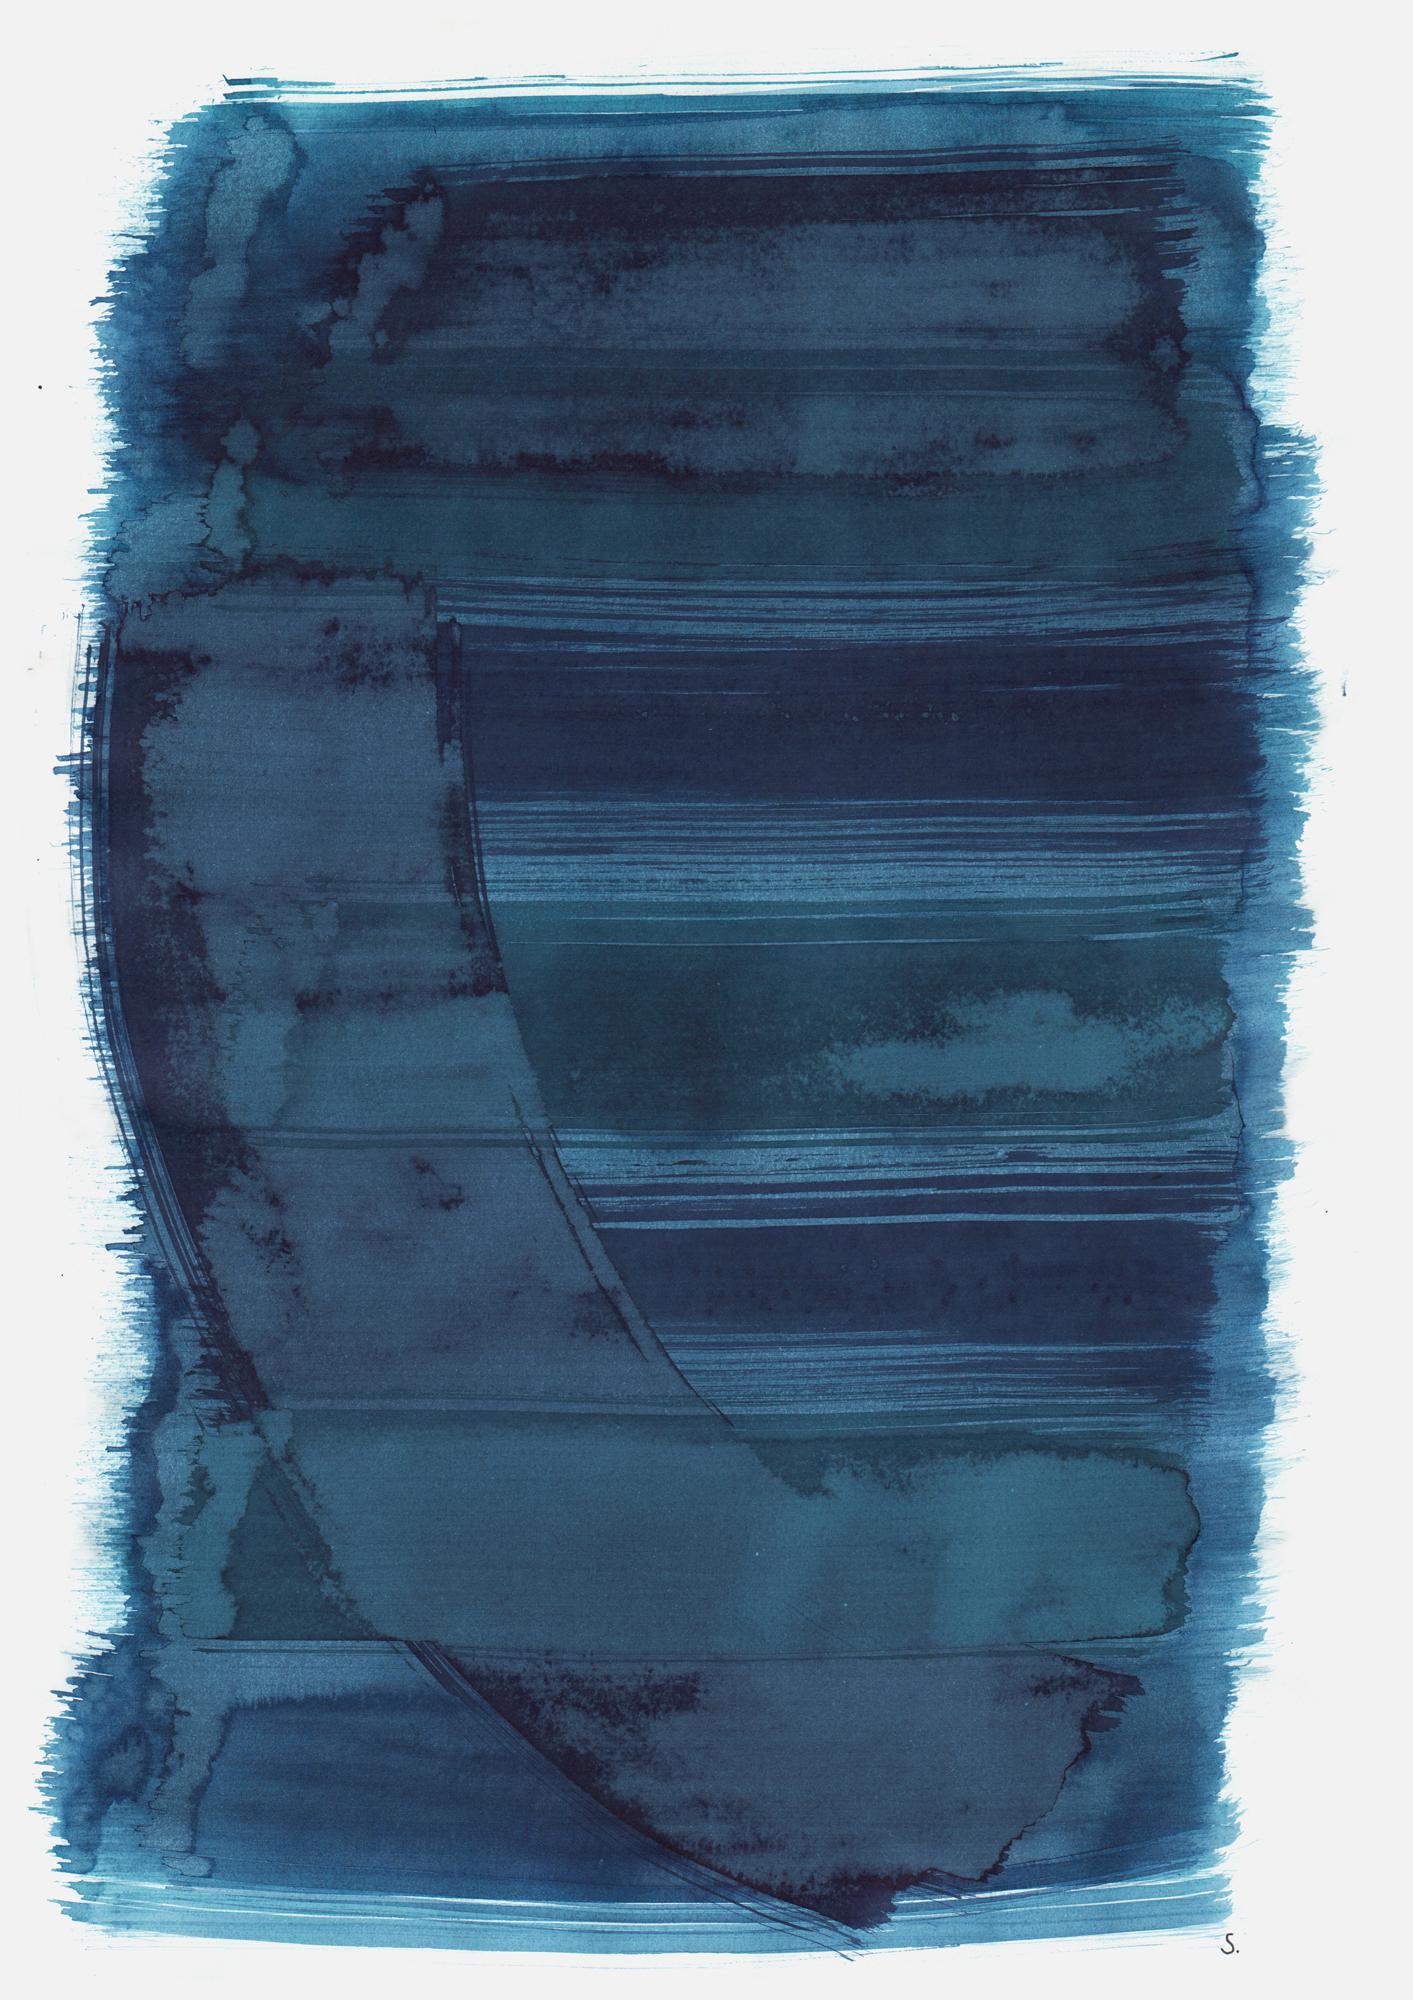 """An Judis Rubin"", 2019, Tusche auf Papier, 48 x 36cm; ©: Konstanze Sailer [Rubin, Judis; * 18.02.1939 in Mannheim; deportiert aus Berlin; † nach dem 09.12.1942 in Auschwitz]"